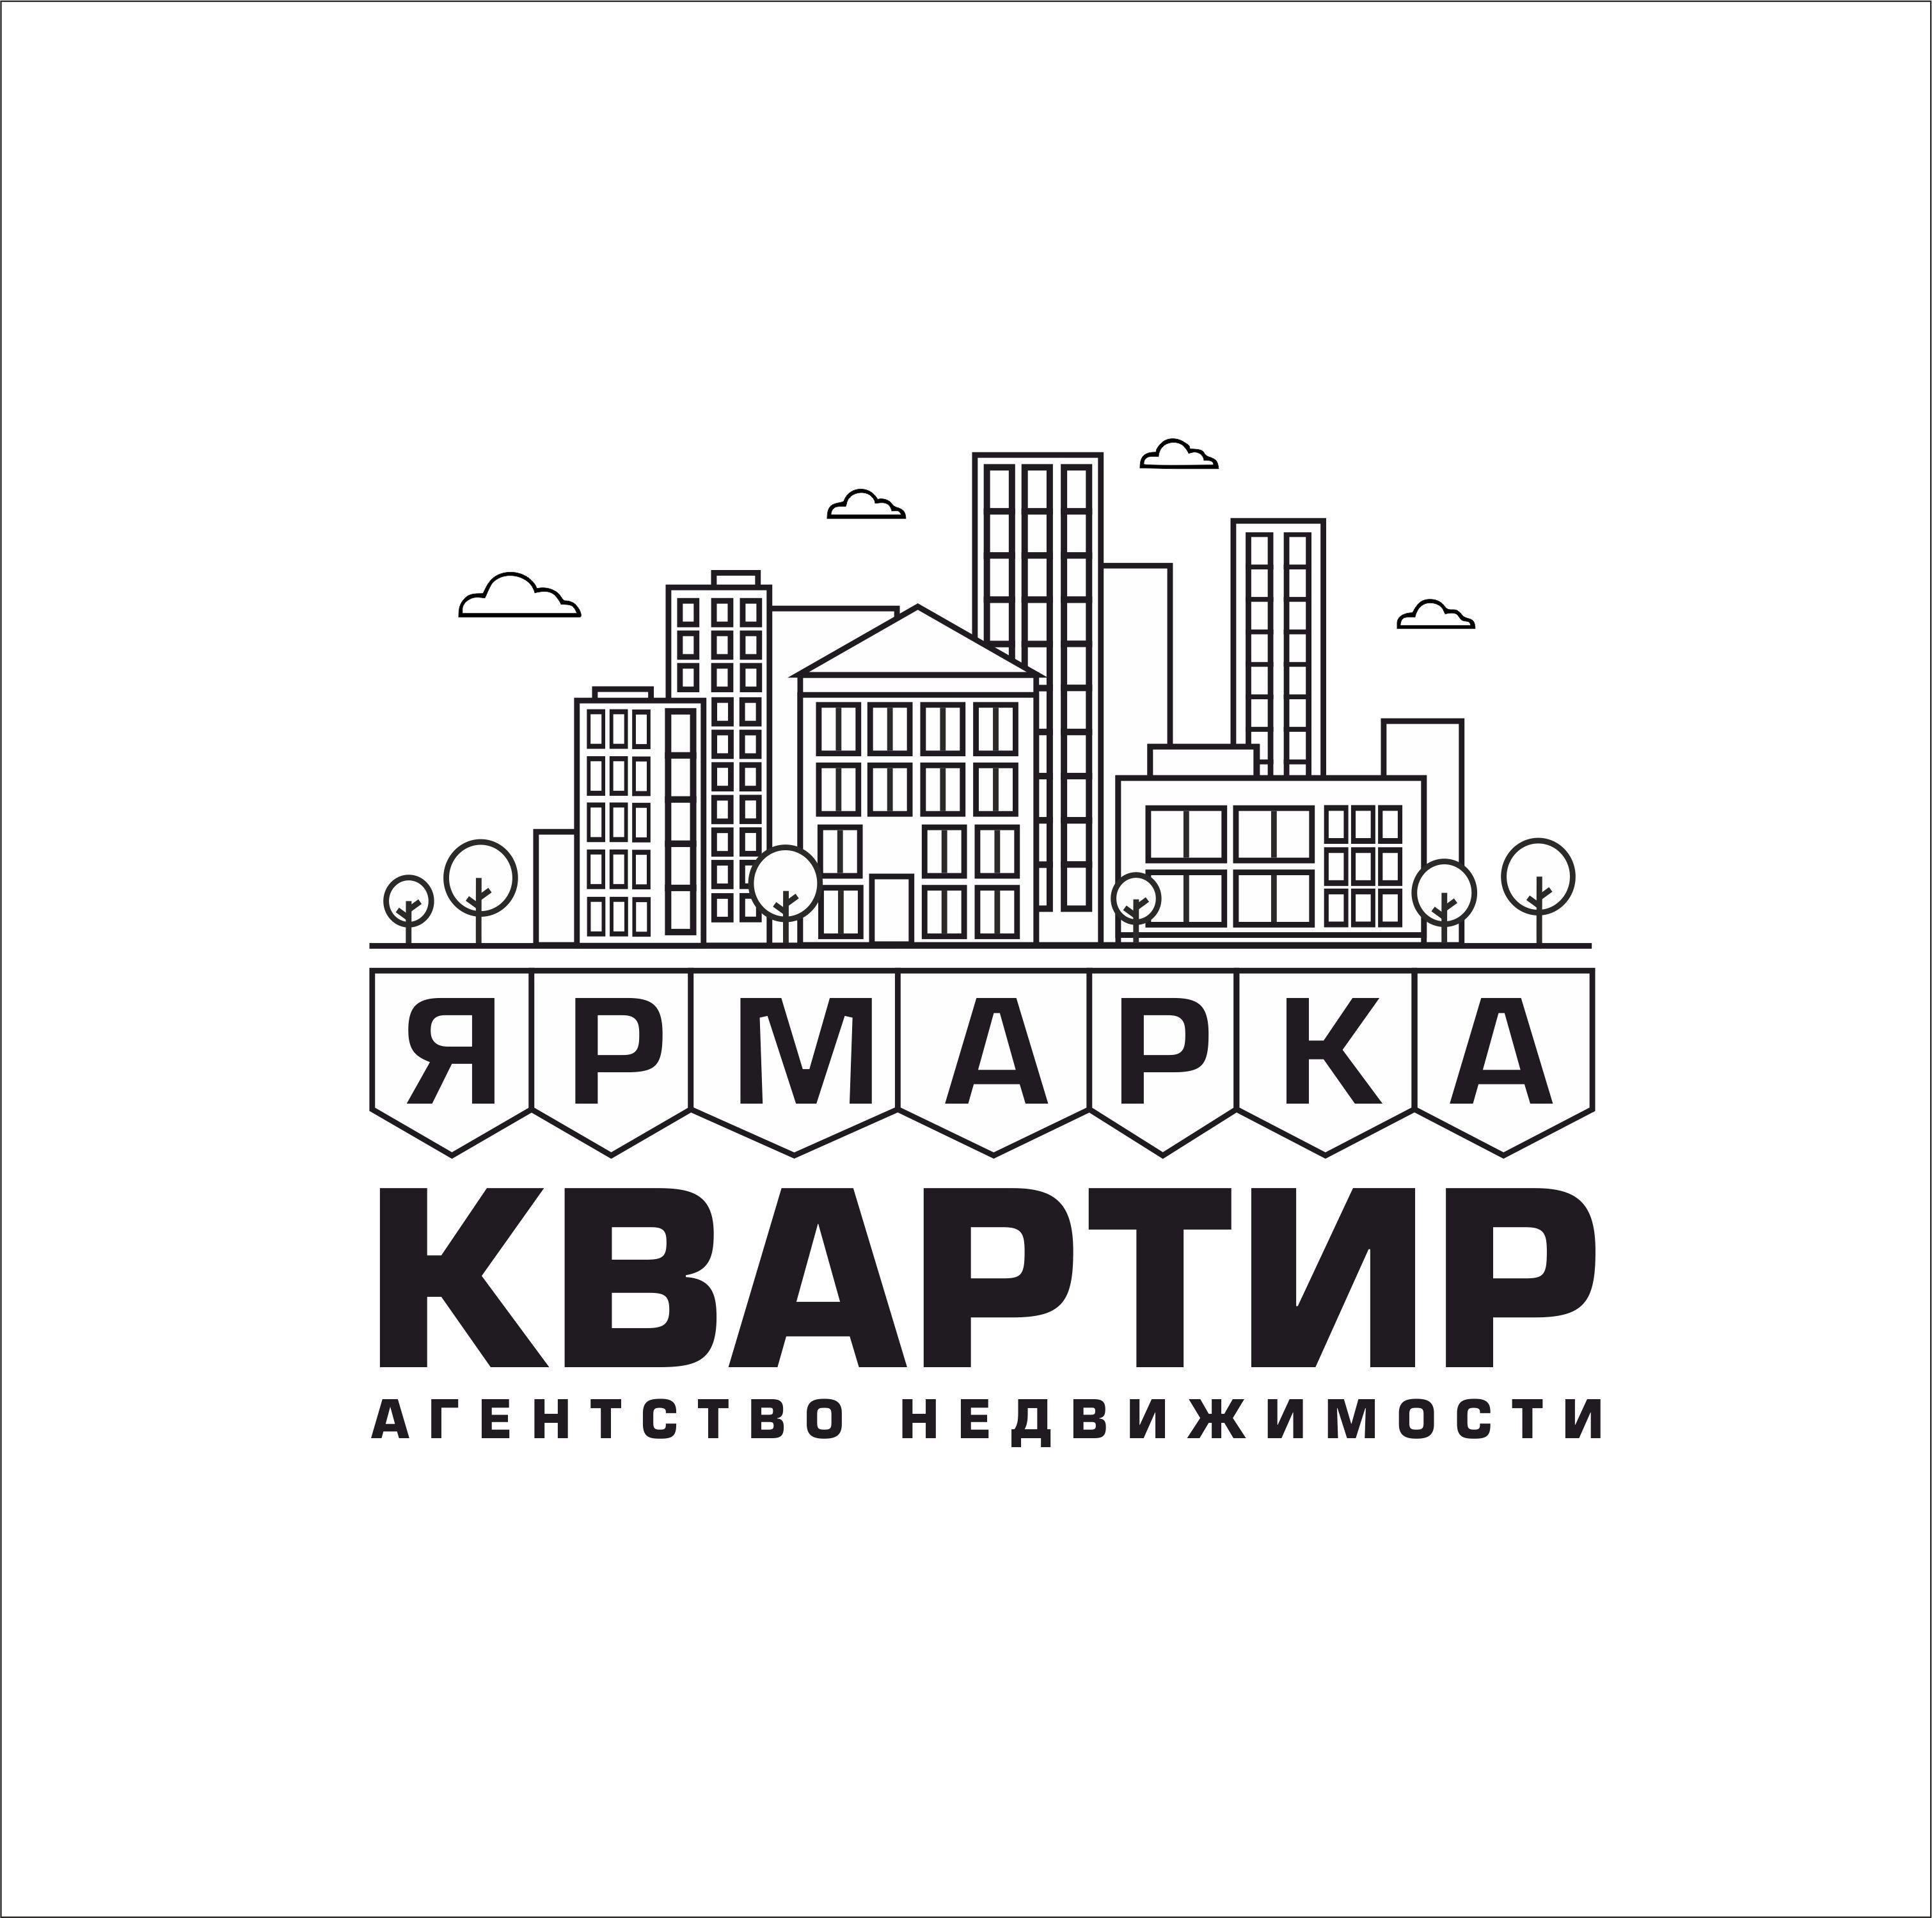 Создание логотипа, с вариантами для визитки и листовки фото f_21260085b0a2f18d.jpg